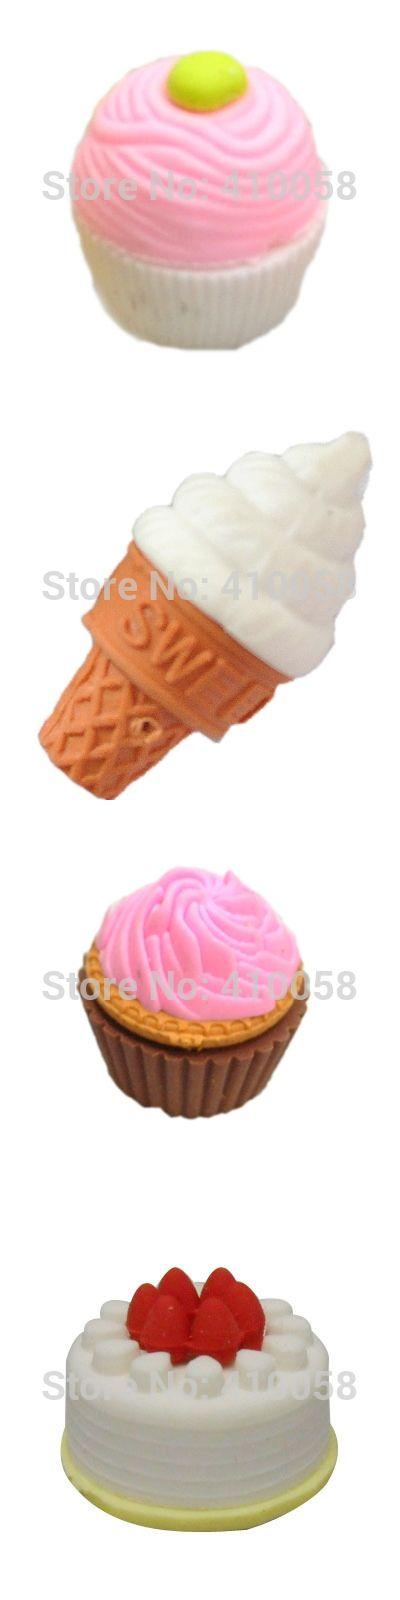 Summer hotselling delicious ice cream eraser  ,school eraser set ,children eraser wholesale for super market and community shop